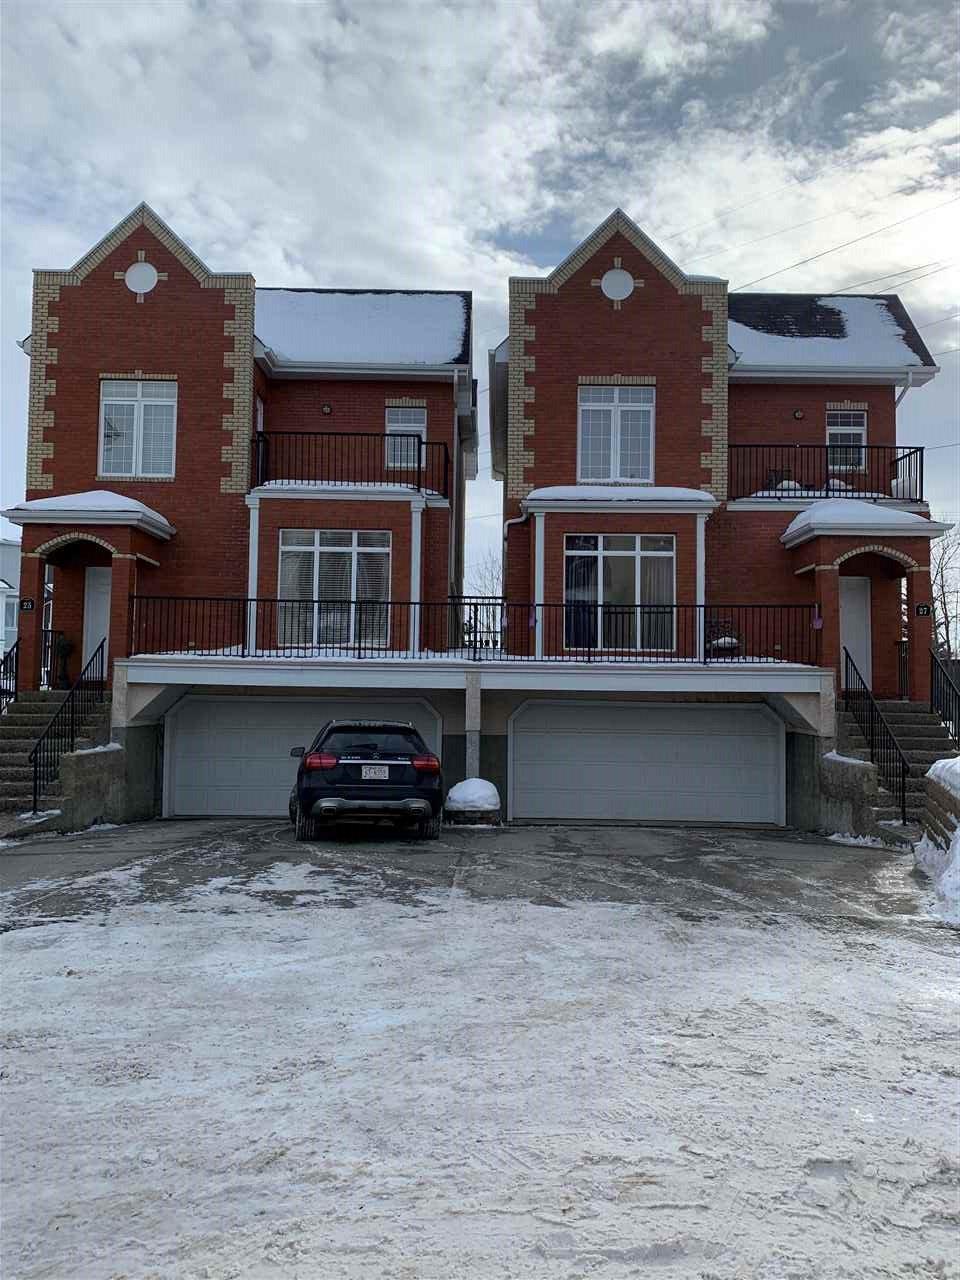 Main Photo: 25 8403 164 Avenue in Edmonton: Zone 28 Townhouse for sale : MLS®# E4187065